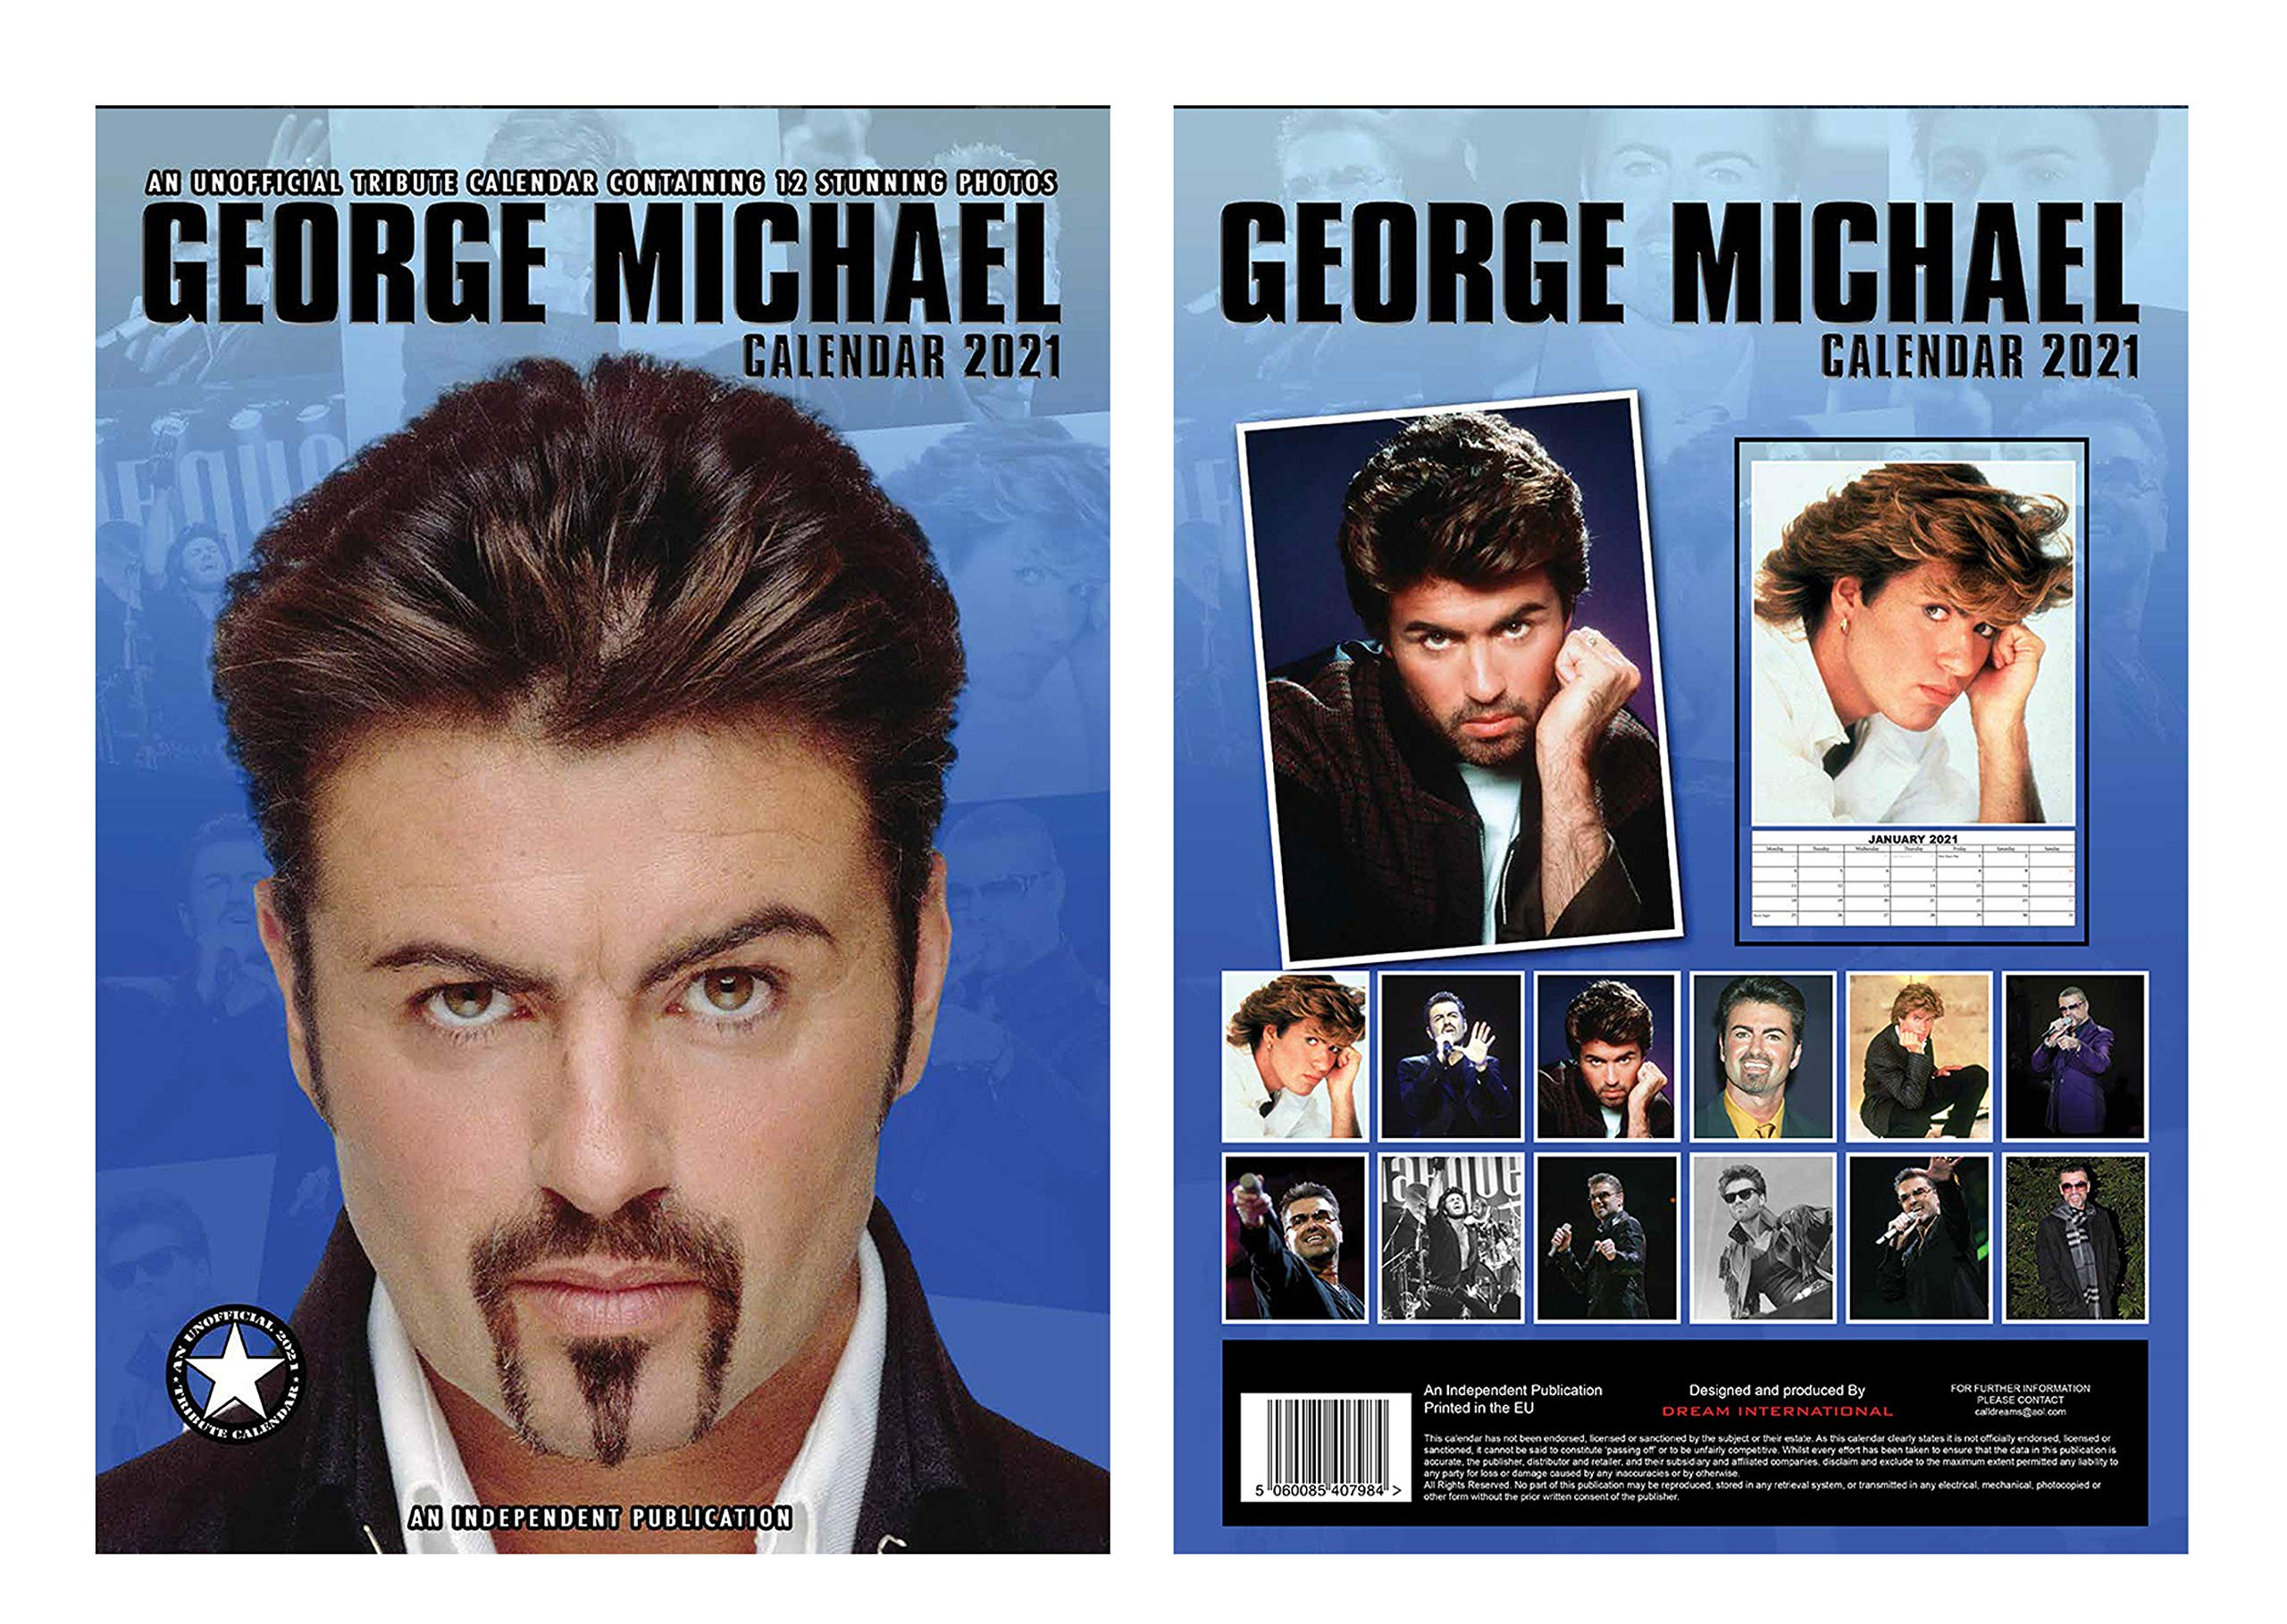 George Michael Calendario 2021 A3 con George Michael Llavero